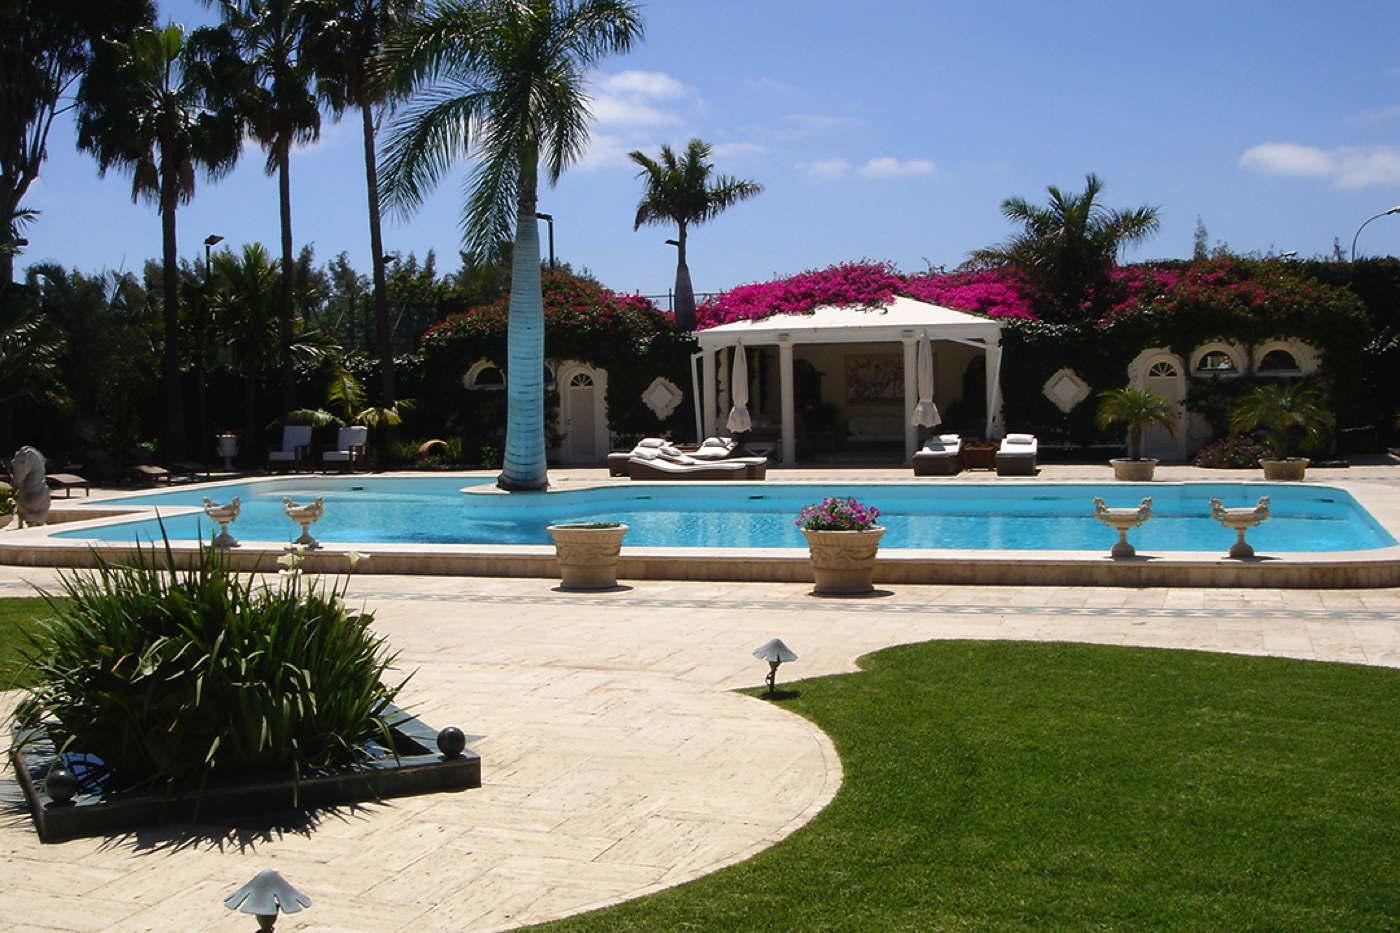 luxusvilla gran canaria spanien mieten bei domizile reisen. Black Bedroom Furniture Sets. Home Design Ideas